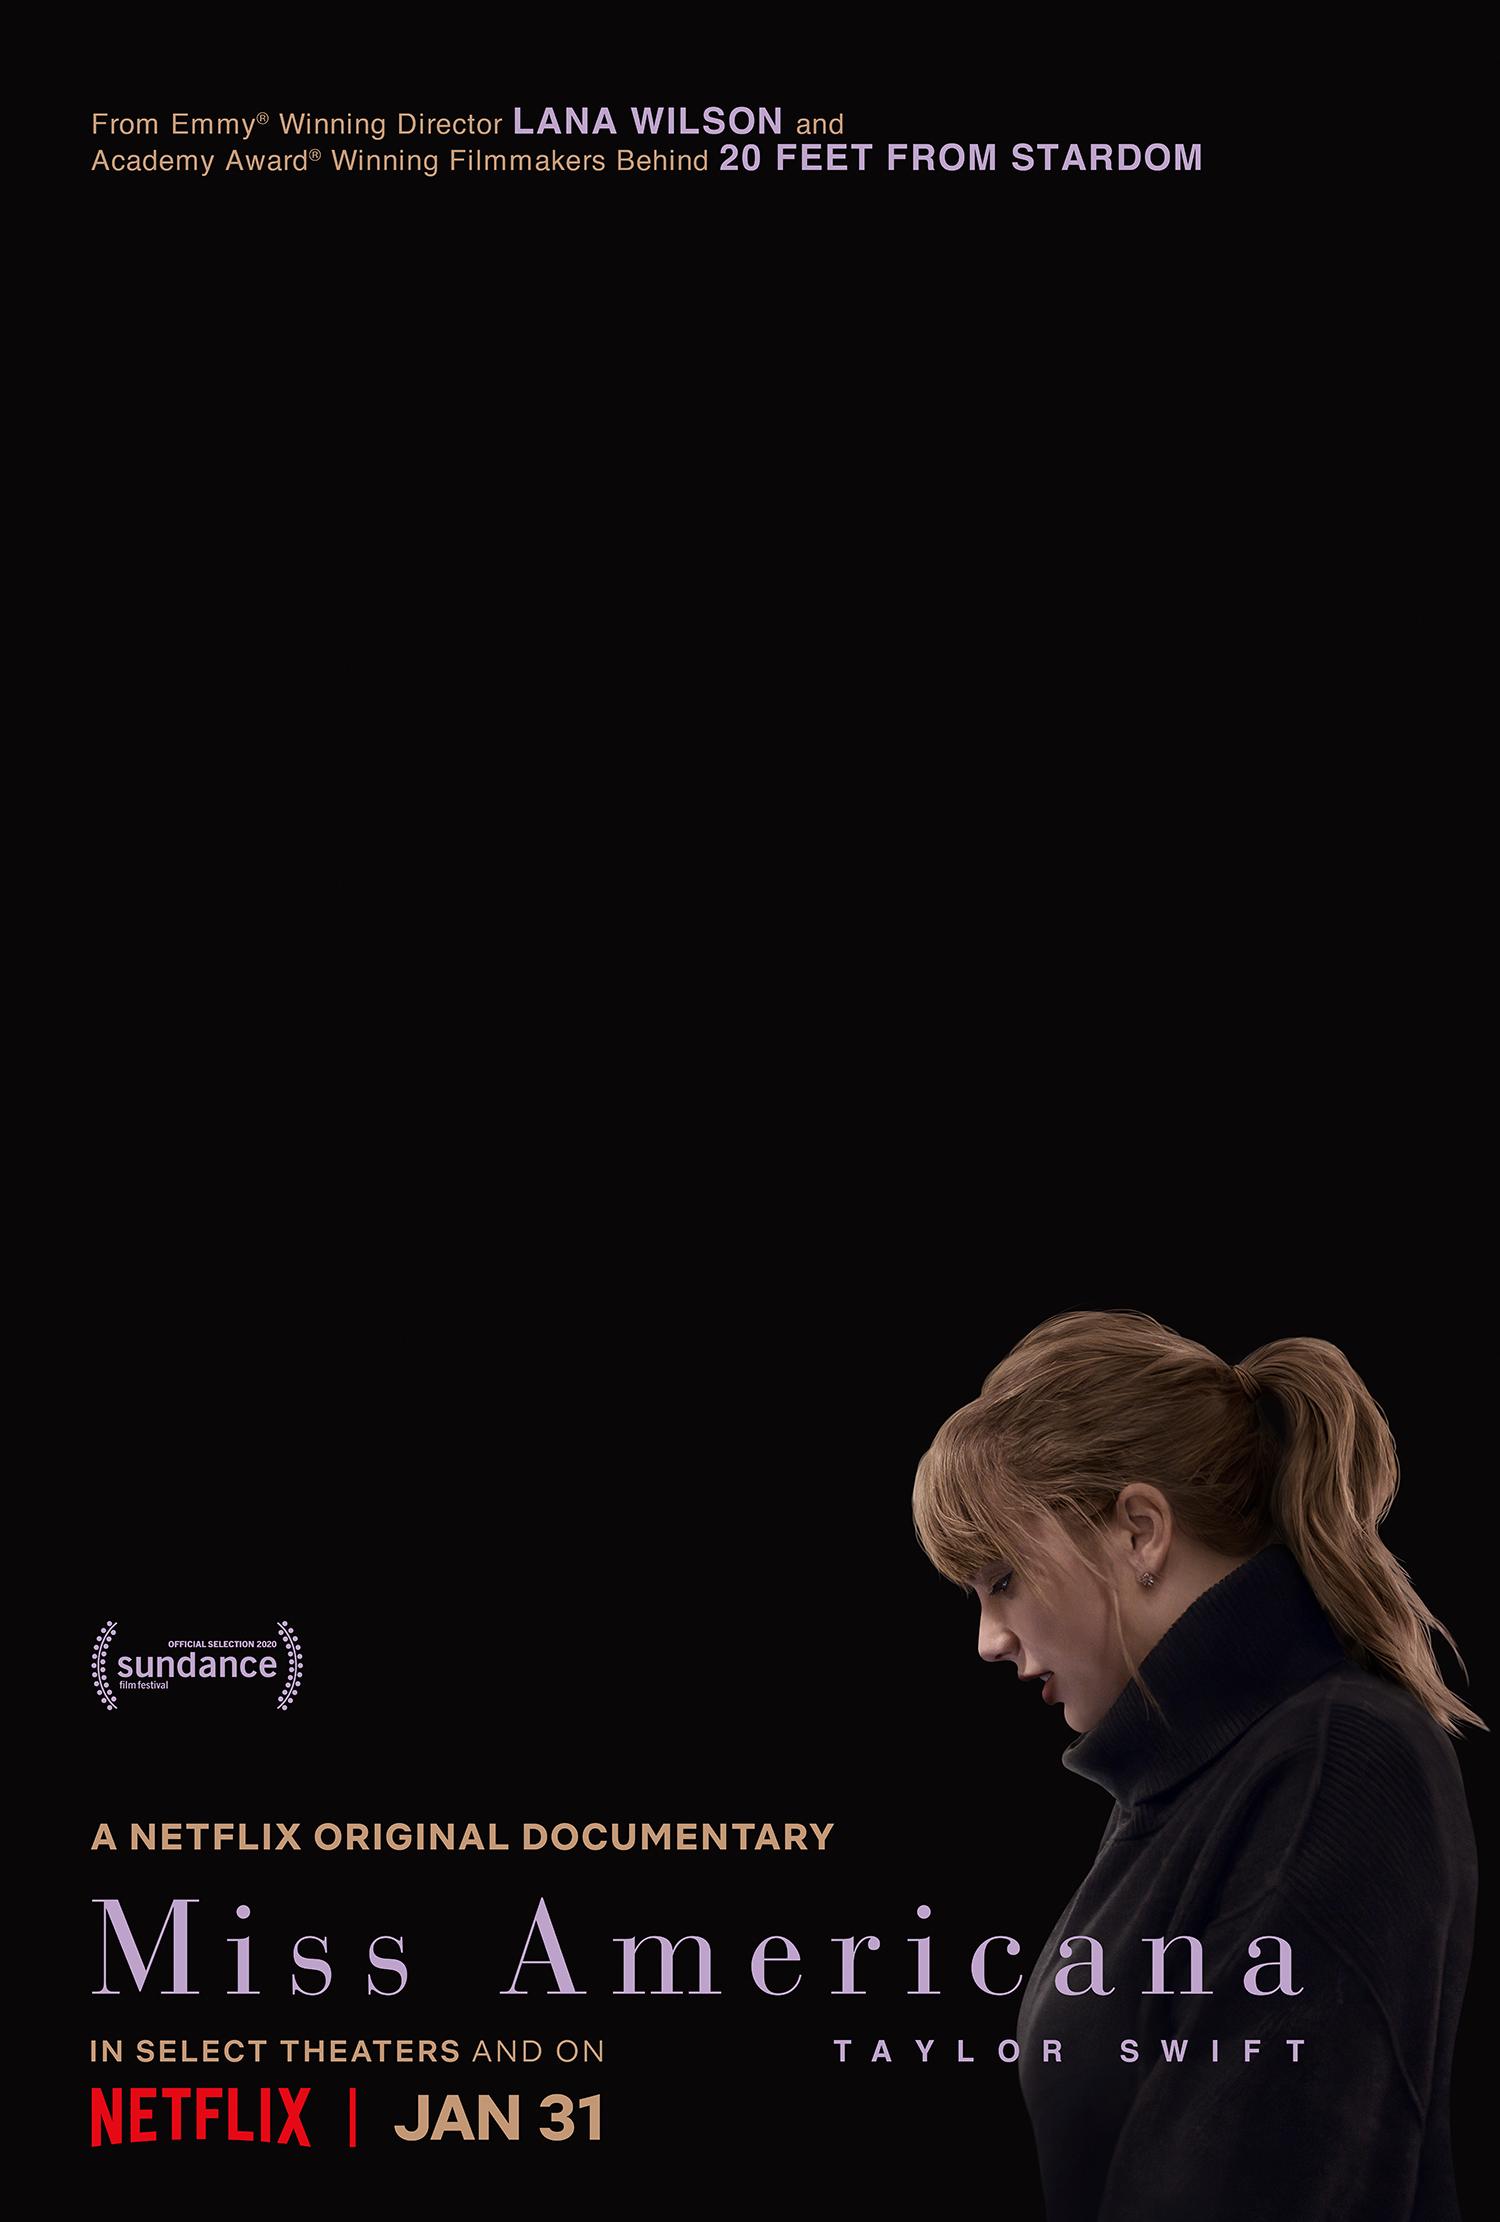 miss americana film dokumenter documenter taylor swift netflix